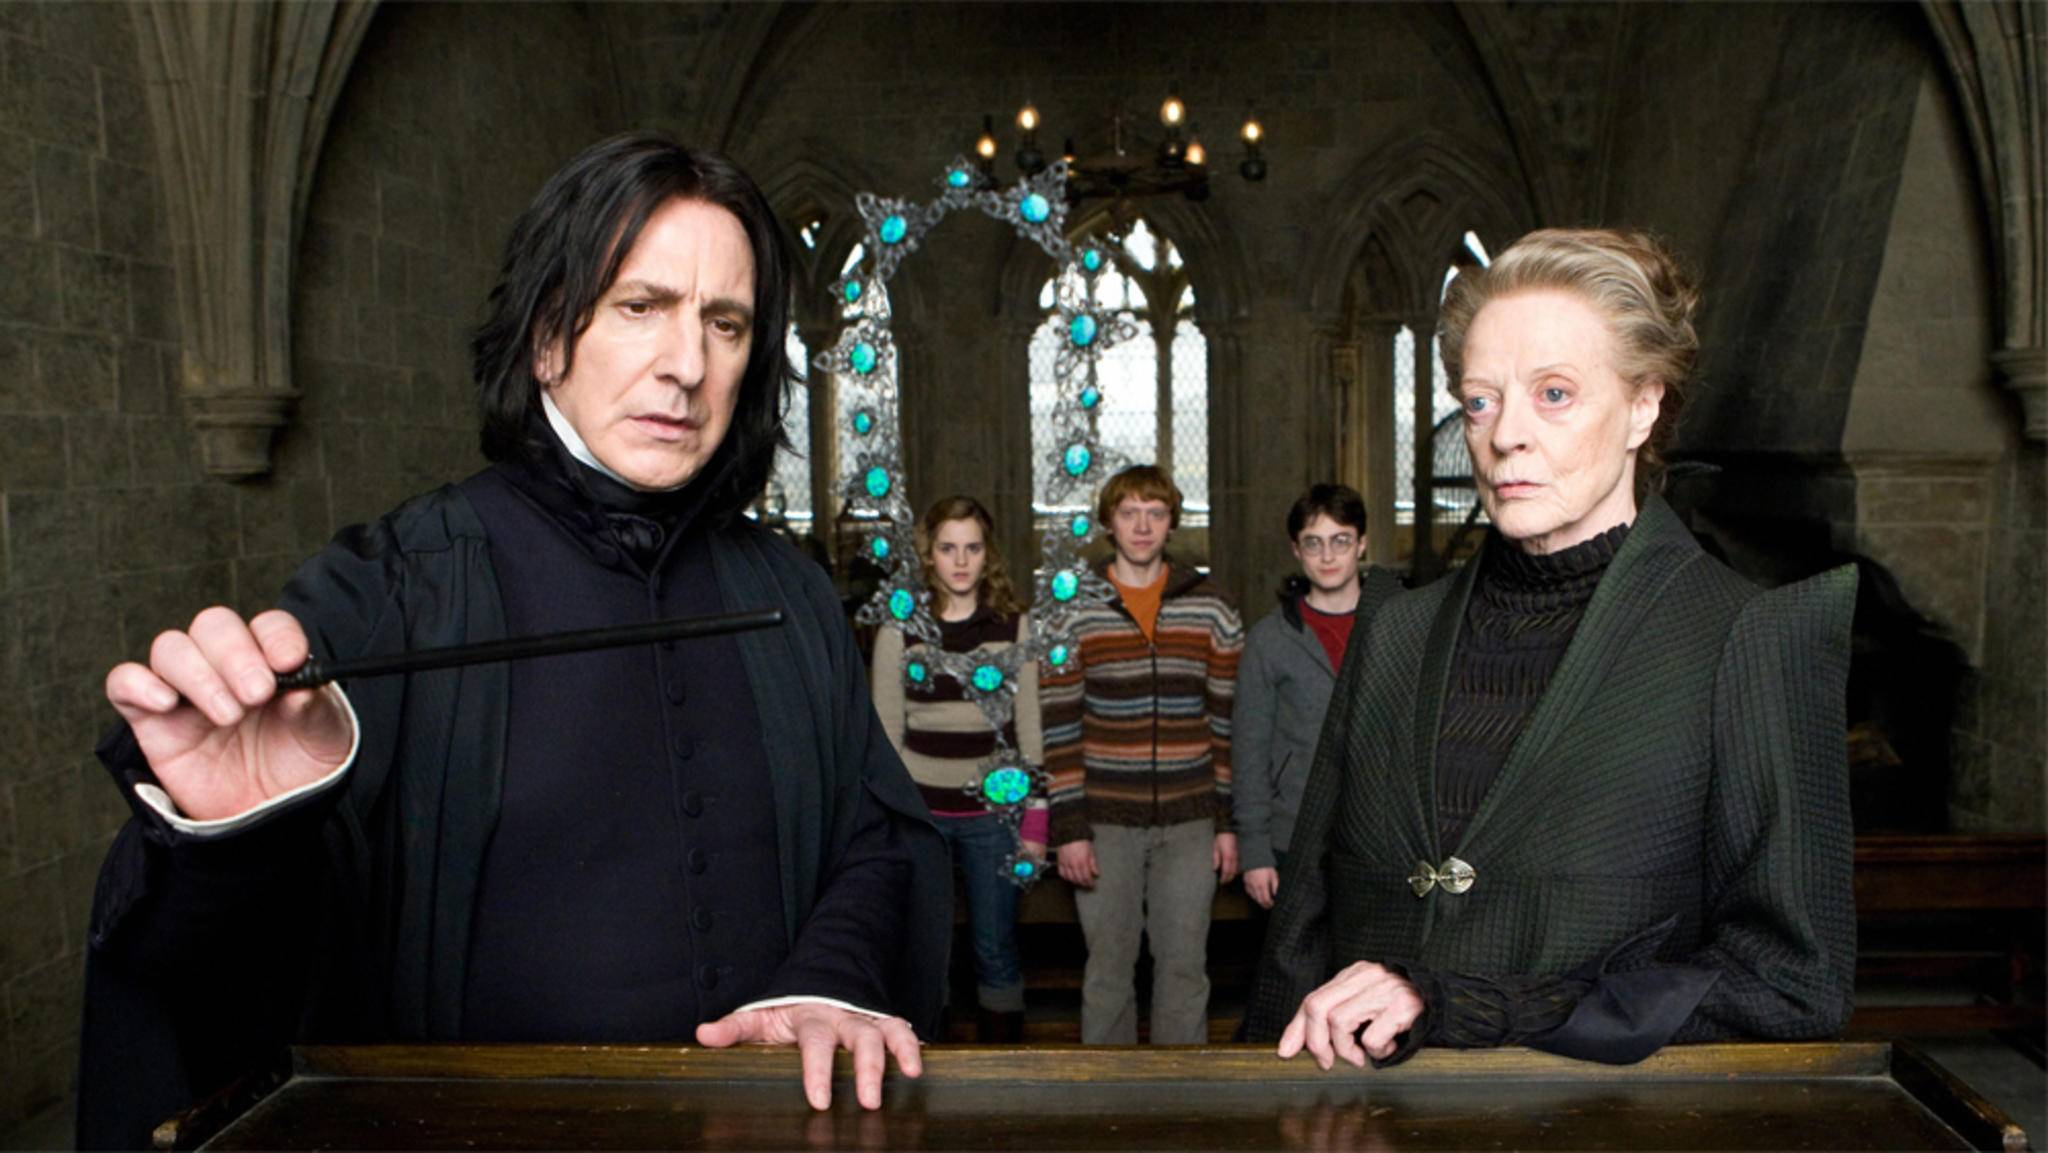 Harry Potter Lehrer Bei Diesen Padagogen Musste Harry Krauterkunde Co Pauken